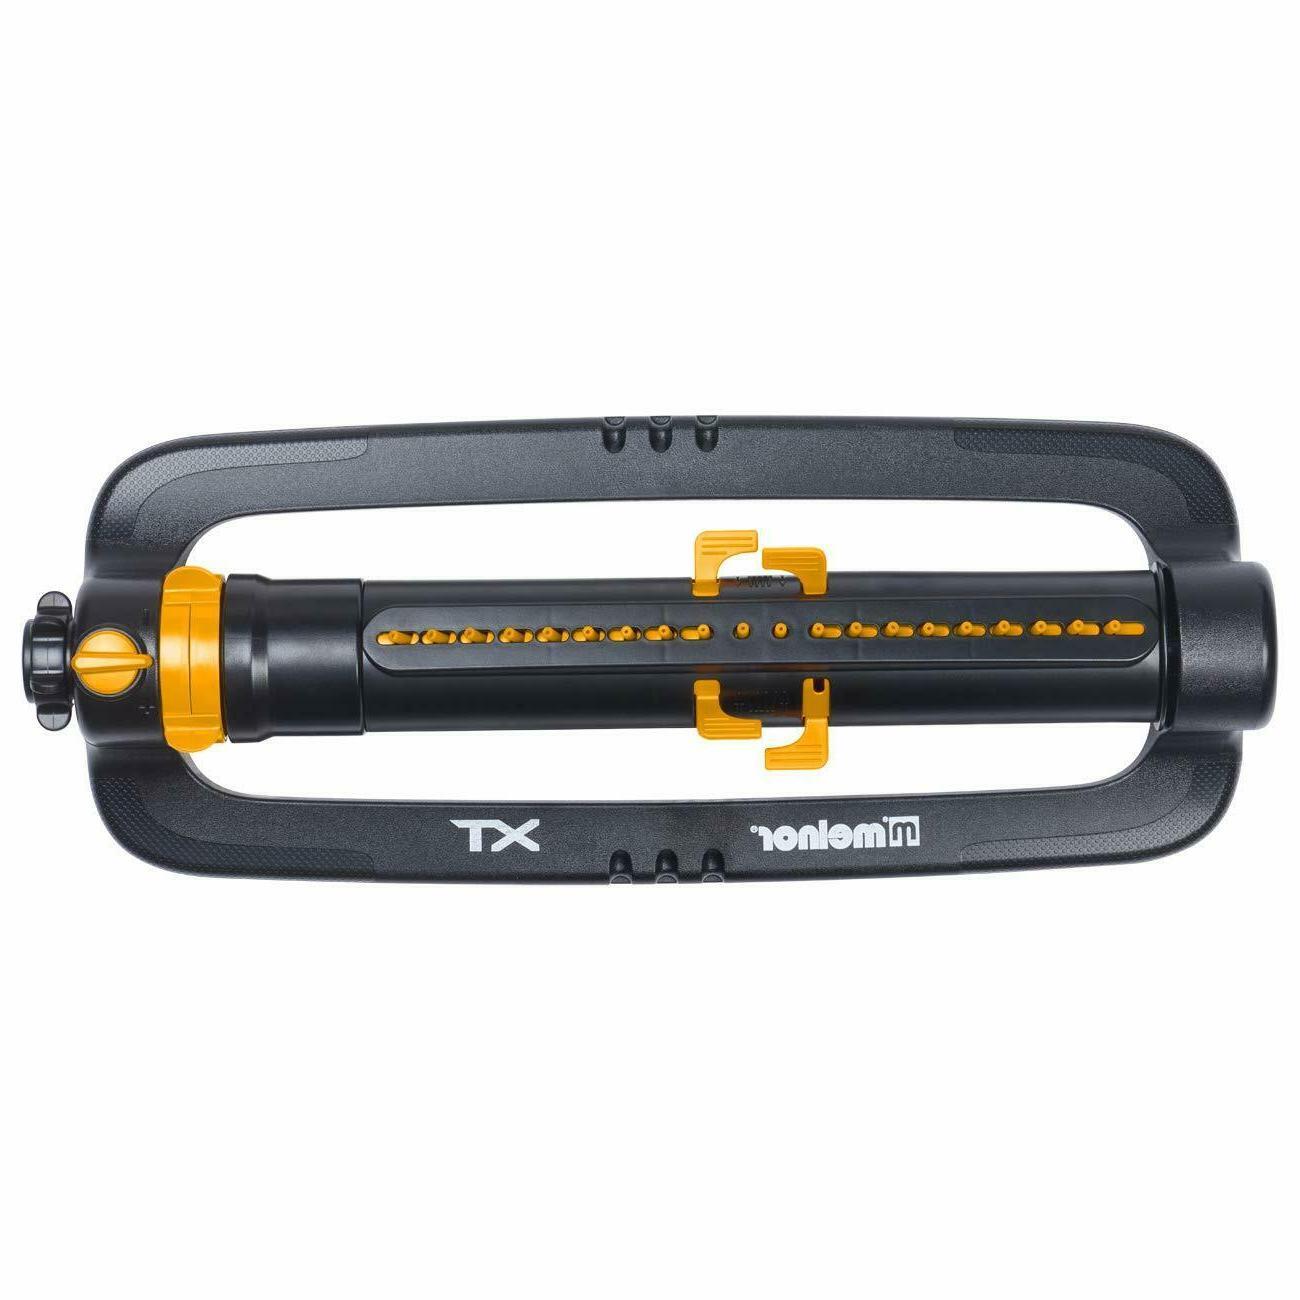 Melnor 65078-AMZ XT Turbo Oscillating Sprinkler 3-Way Adjustment